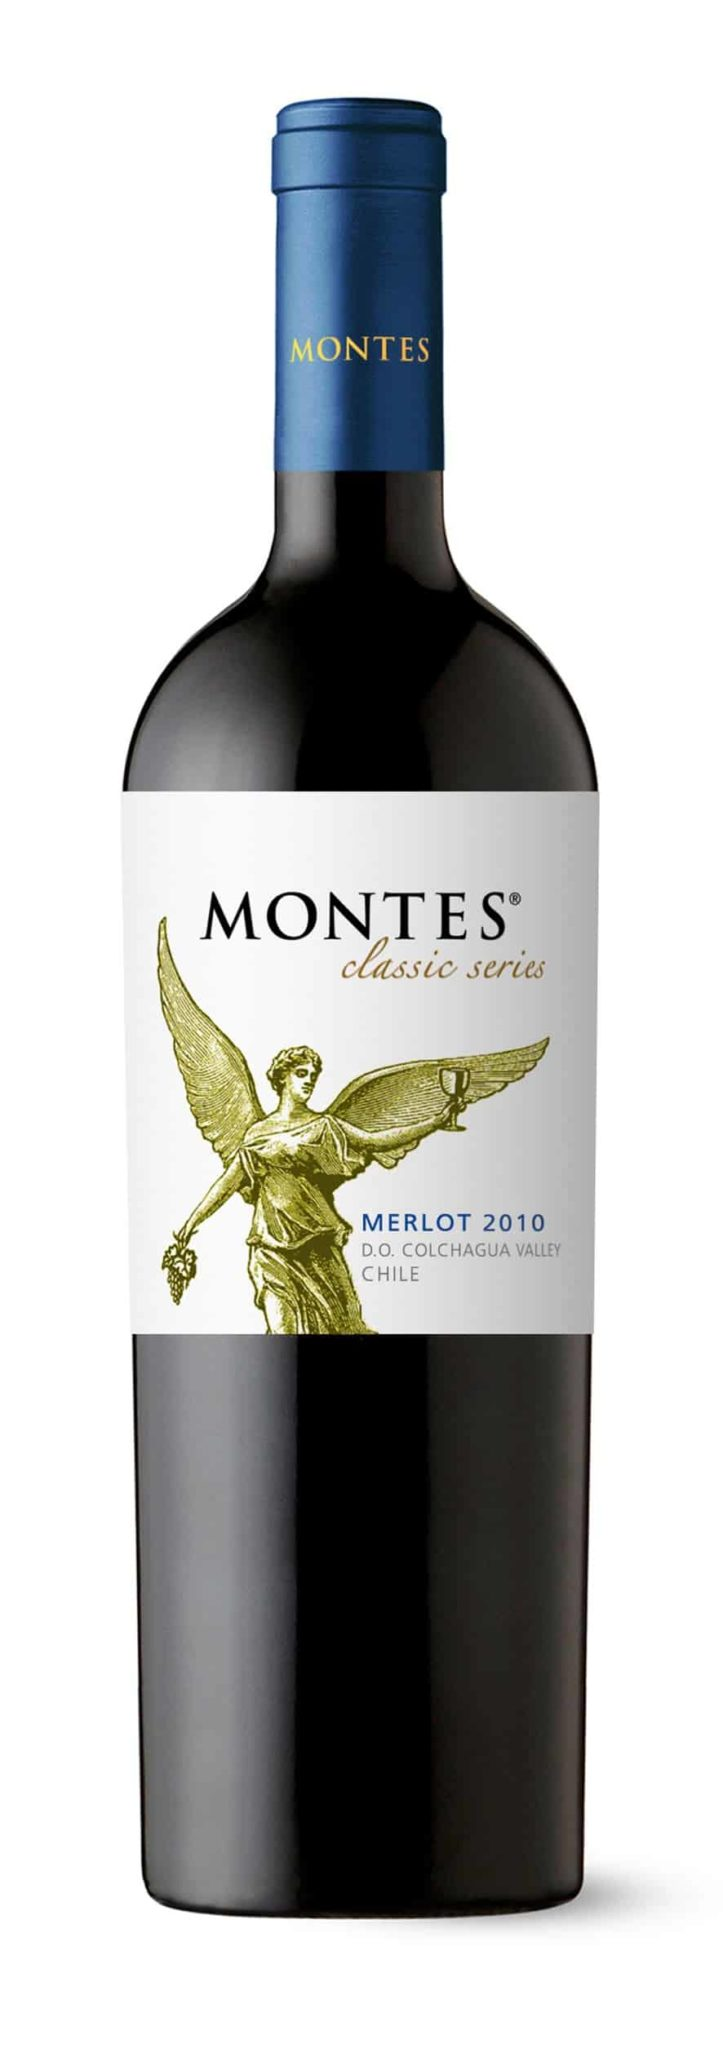 Montes Merlot Classic Series 12 _ 13 2012_2013 75cl